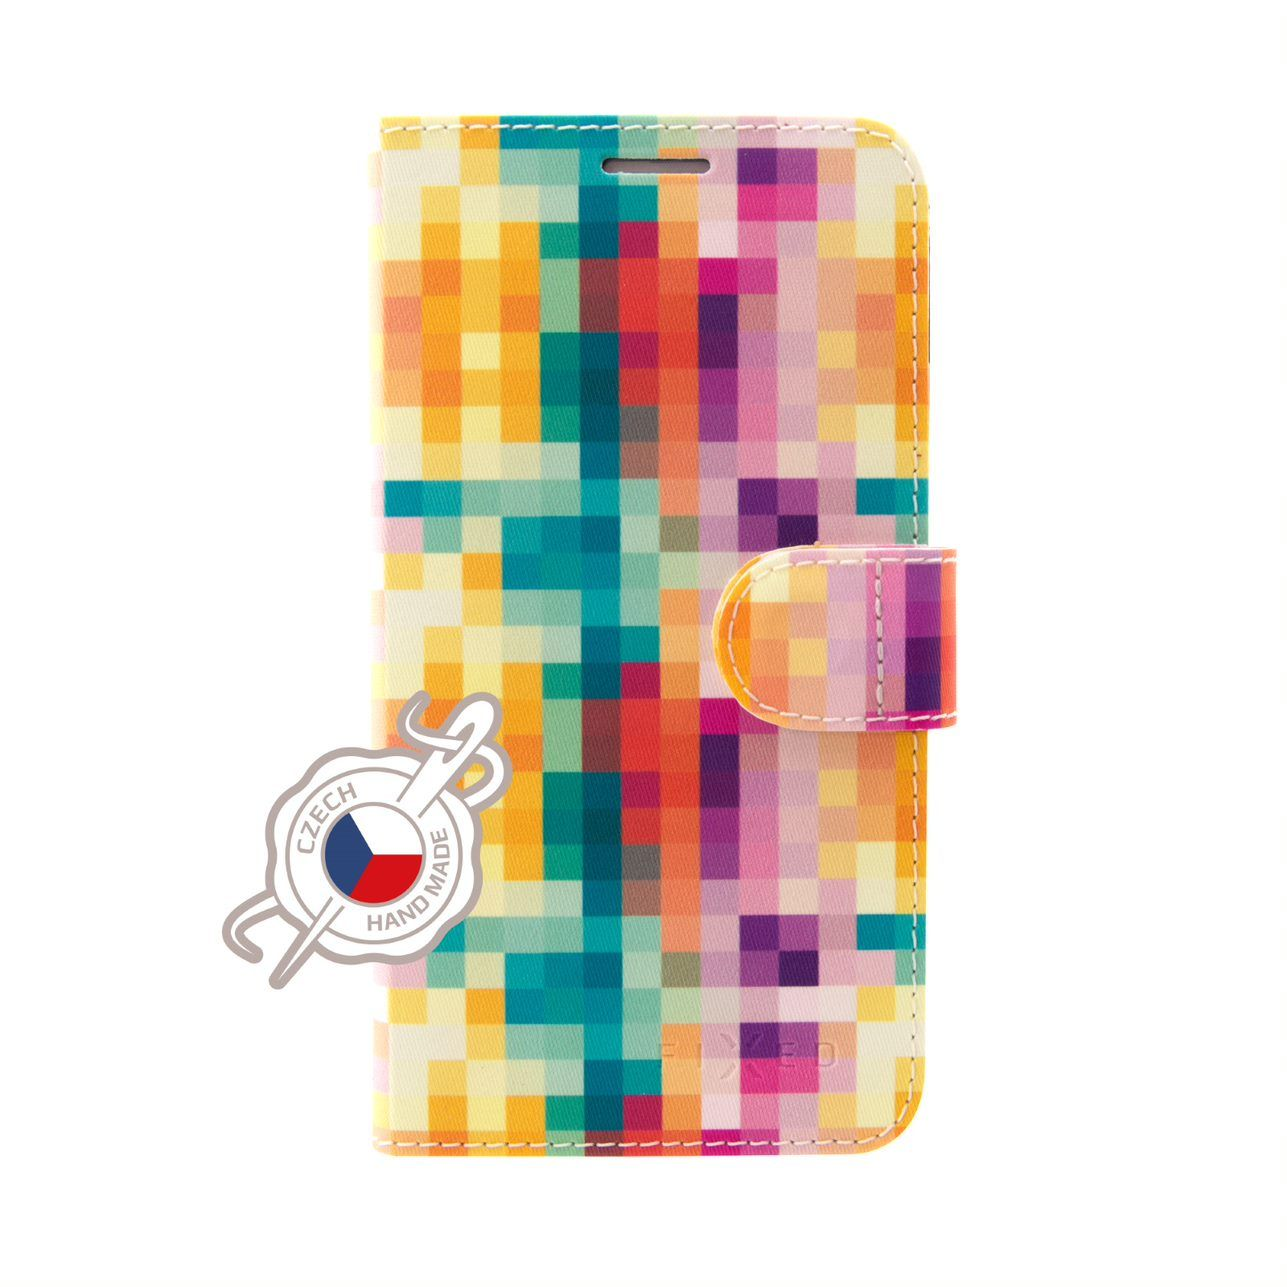 FIXED FIT flipové pouzdro pro Samsung Galaxy Xcover 4/4S, motiv Dice